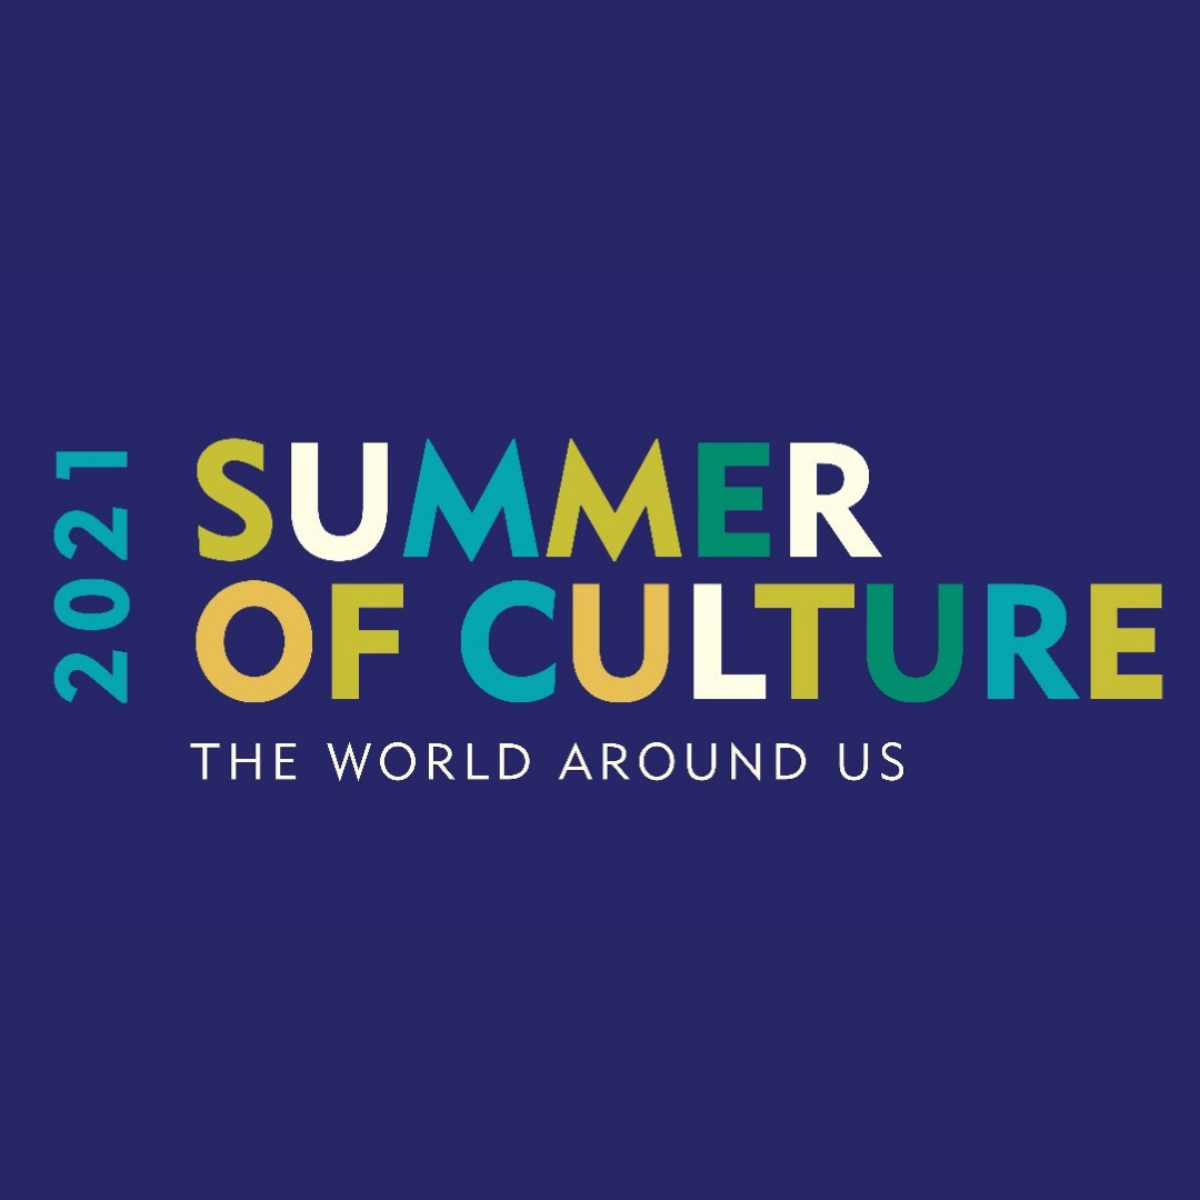 Summer of Culture